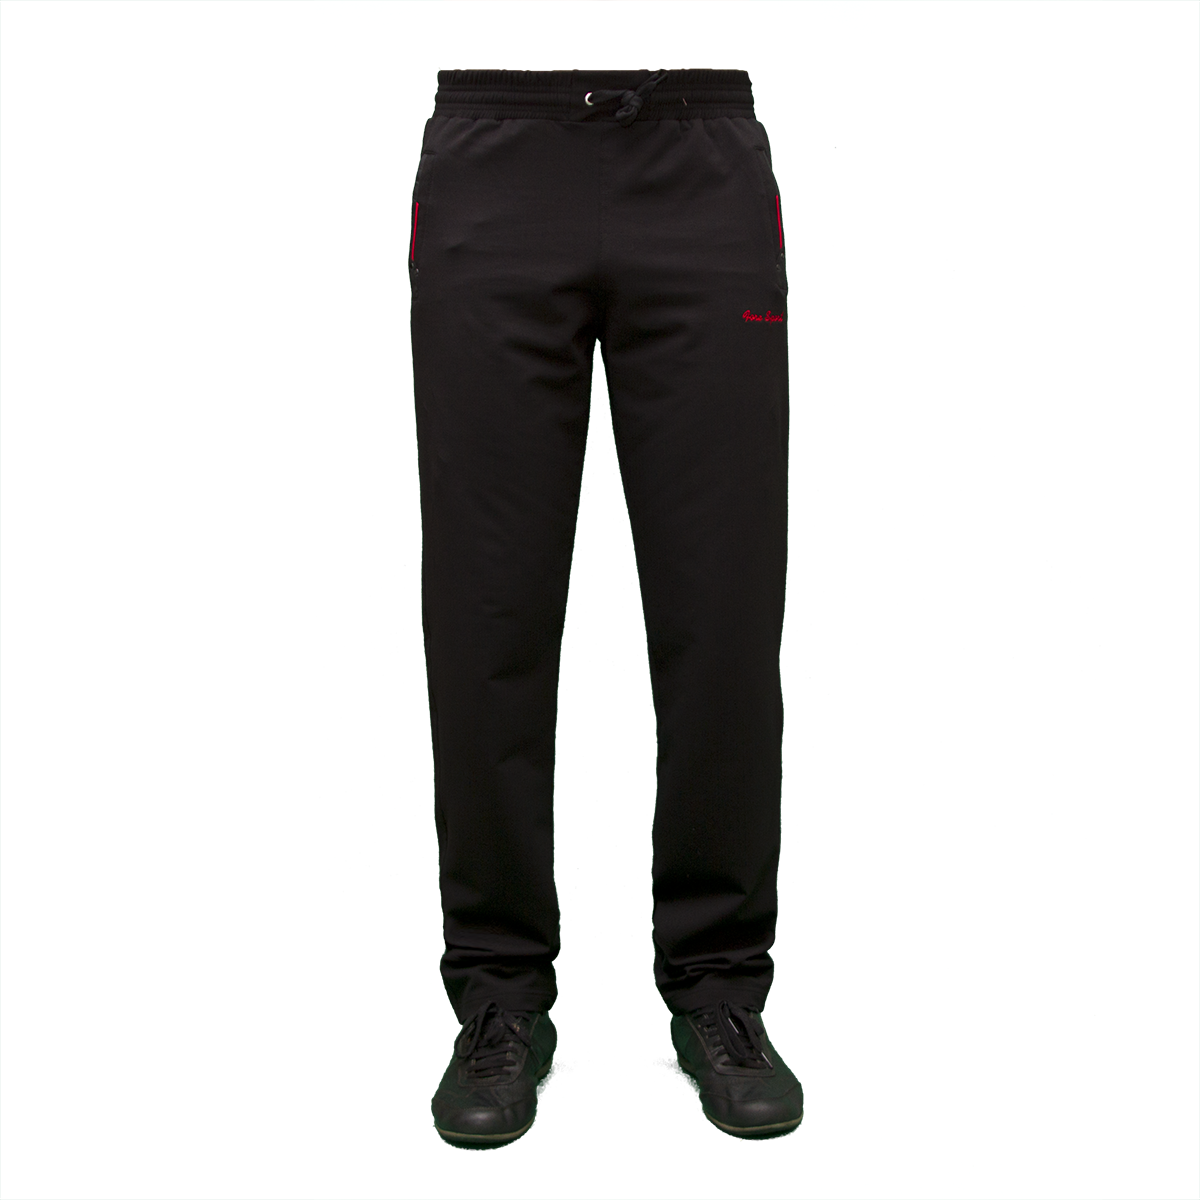 Спортивные брюки на мужчин  тм. FORE арт.9294